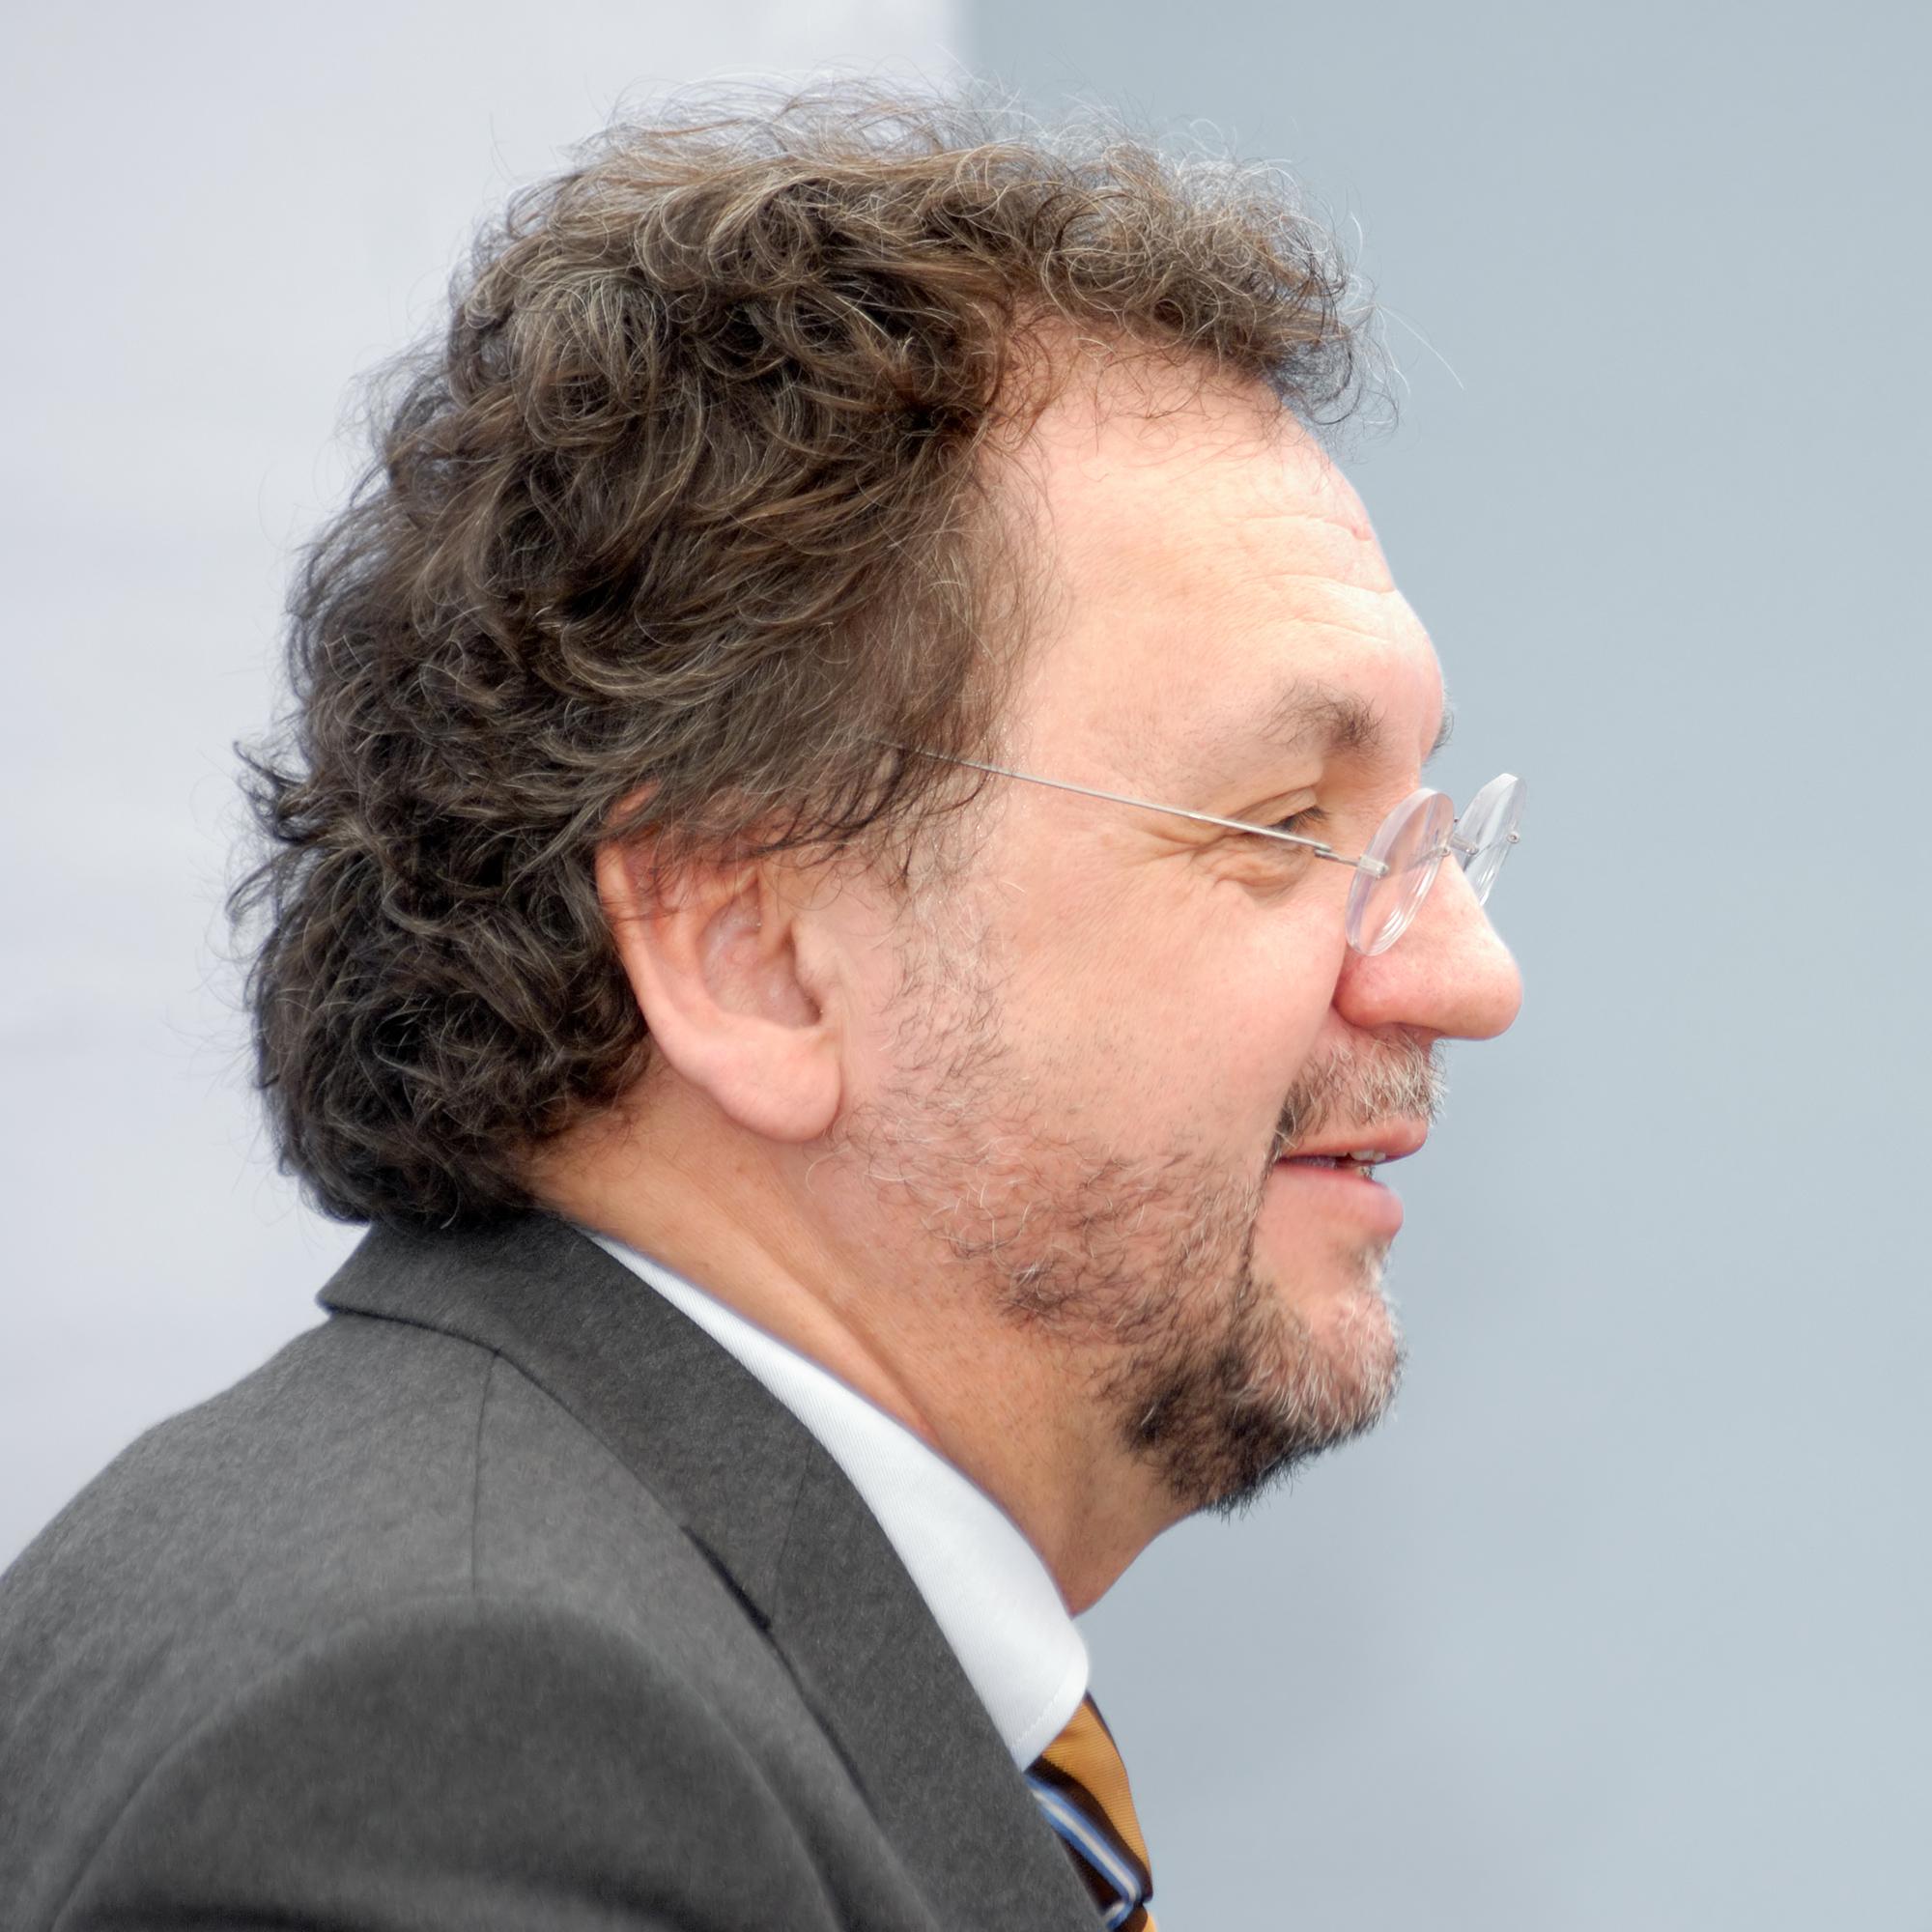 Heribert Prantl (CC André Karwath)